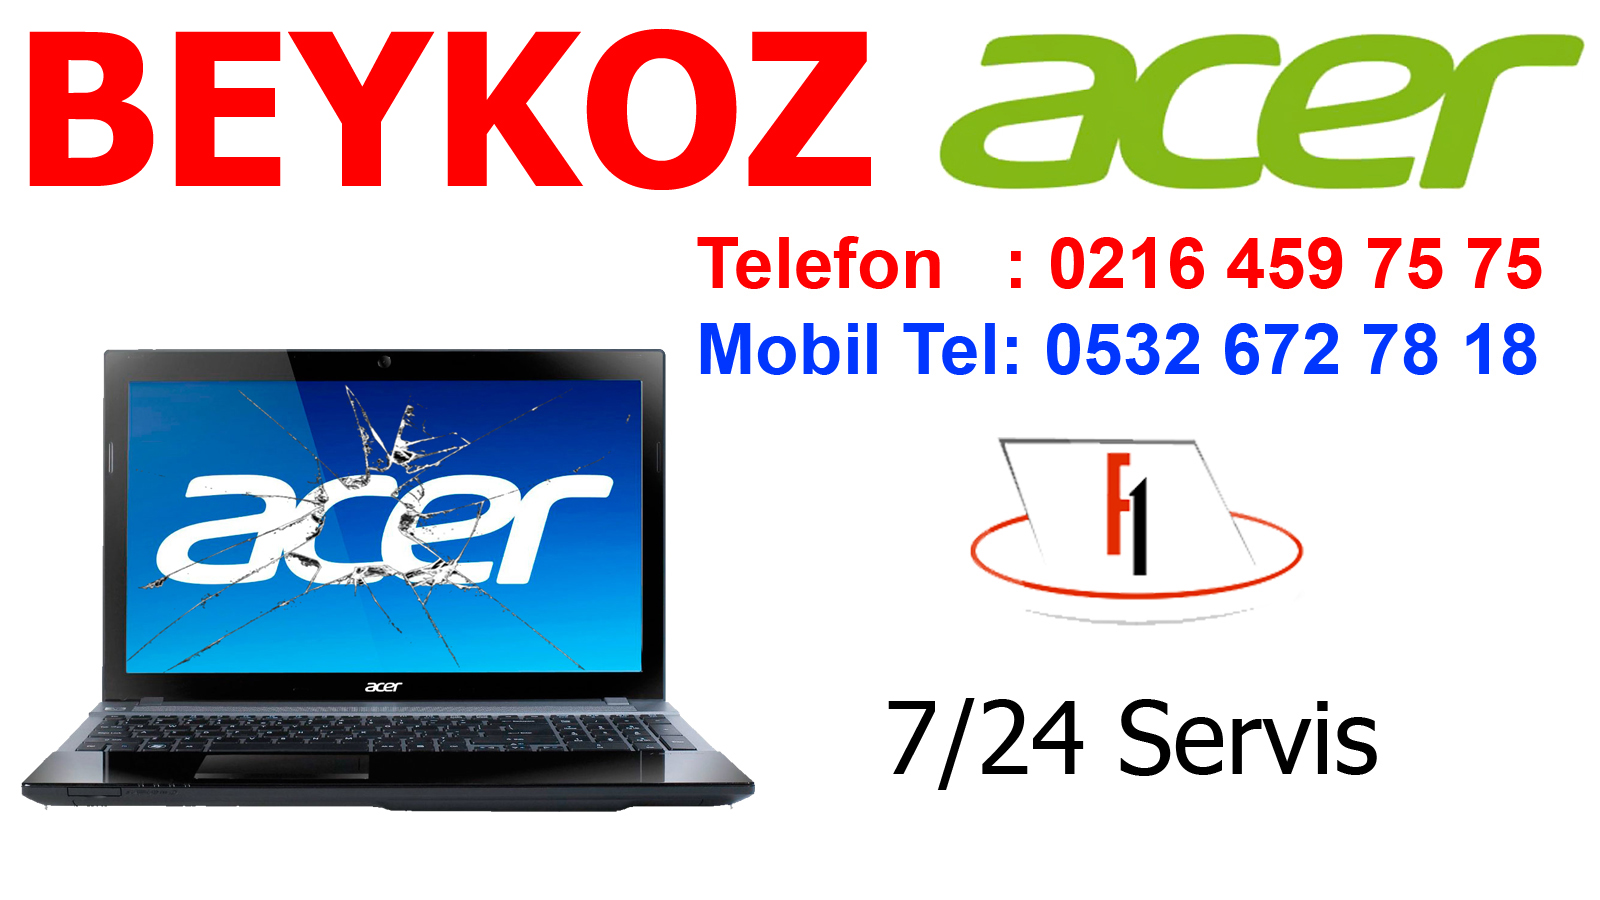 İstanbul Beykoz Acer Servisi (Tel: 0216 459 7575)